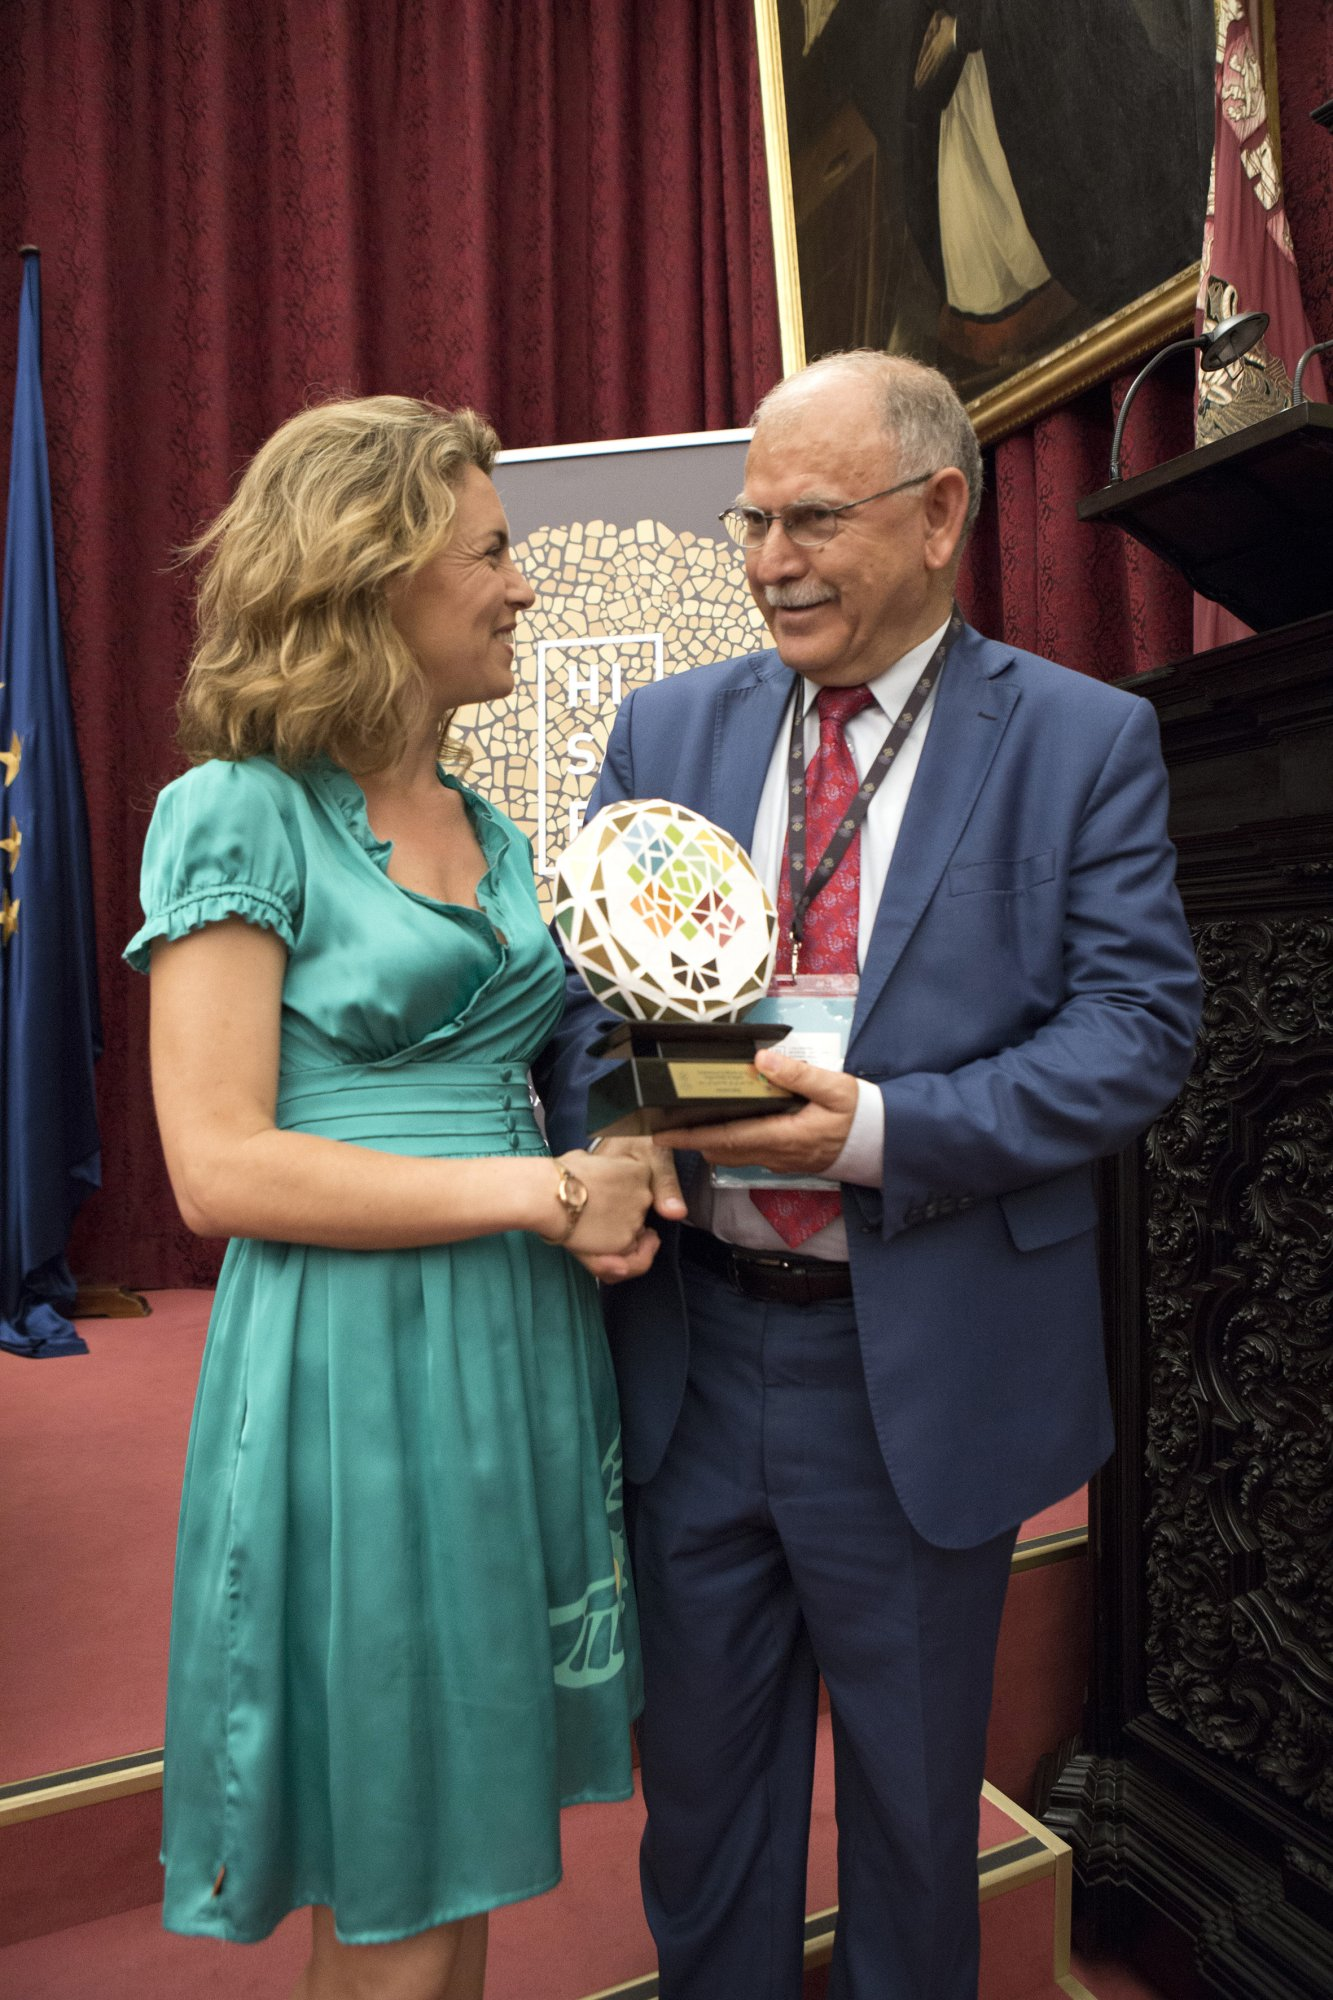 Ms. Pilar Garrido from Universidad de Murcia and Prof. Al Adwan General Secretary of the Association of Arab Universities